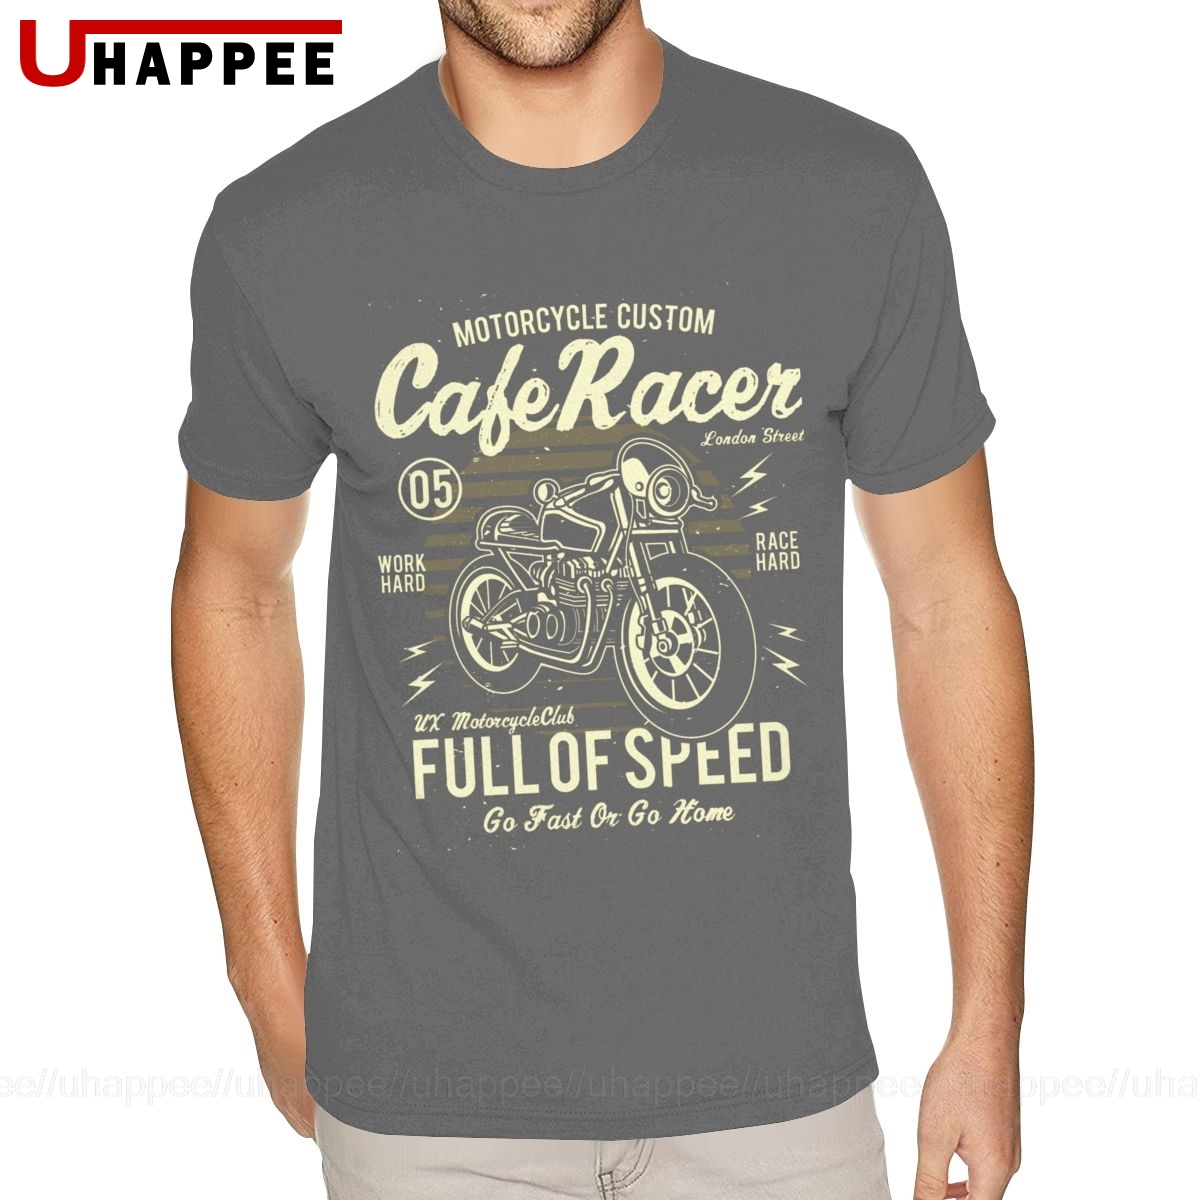 Oversize Cafe Racer Motorcycle Retro Vintage Shirts Mens Grunge Style Custom Short Sleeve Man T Shirt Summer 2020 Top Apparel